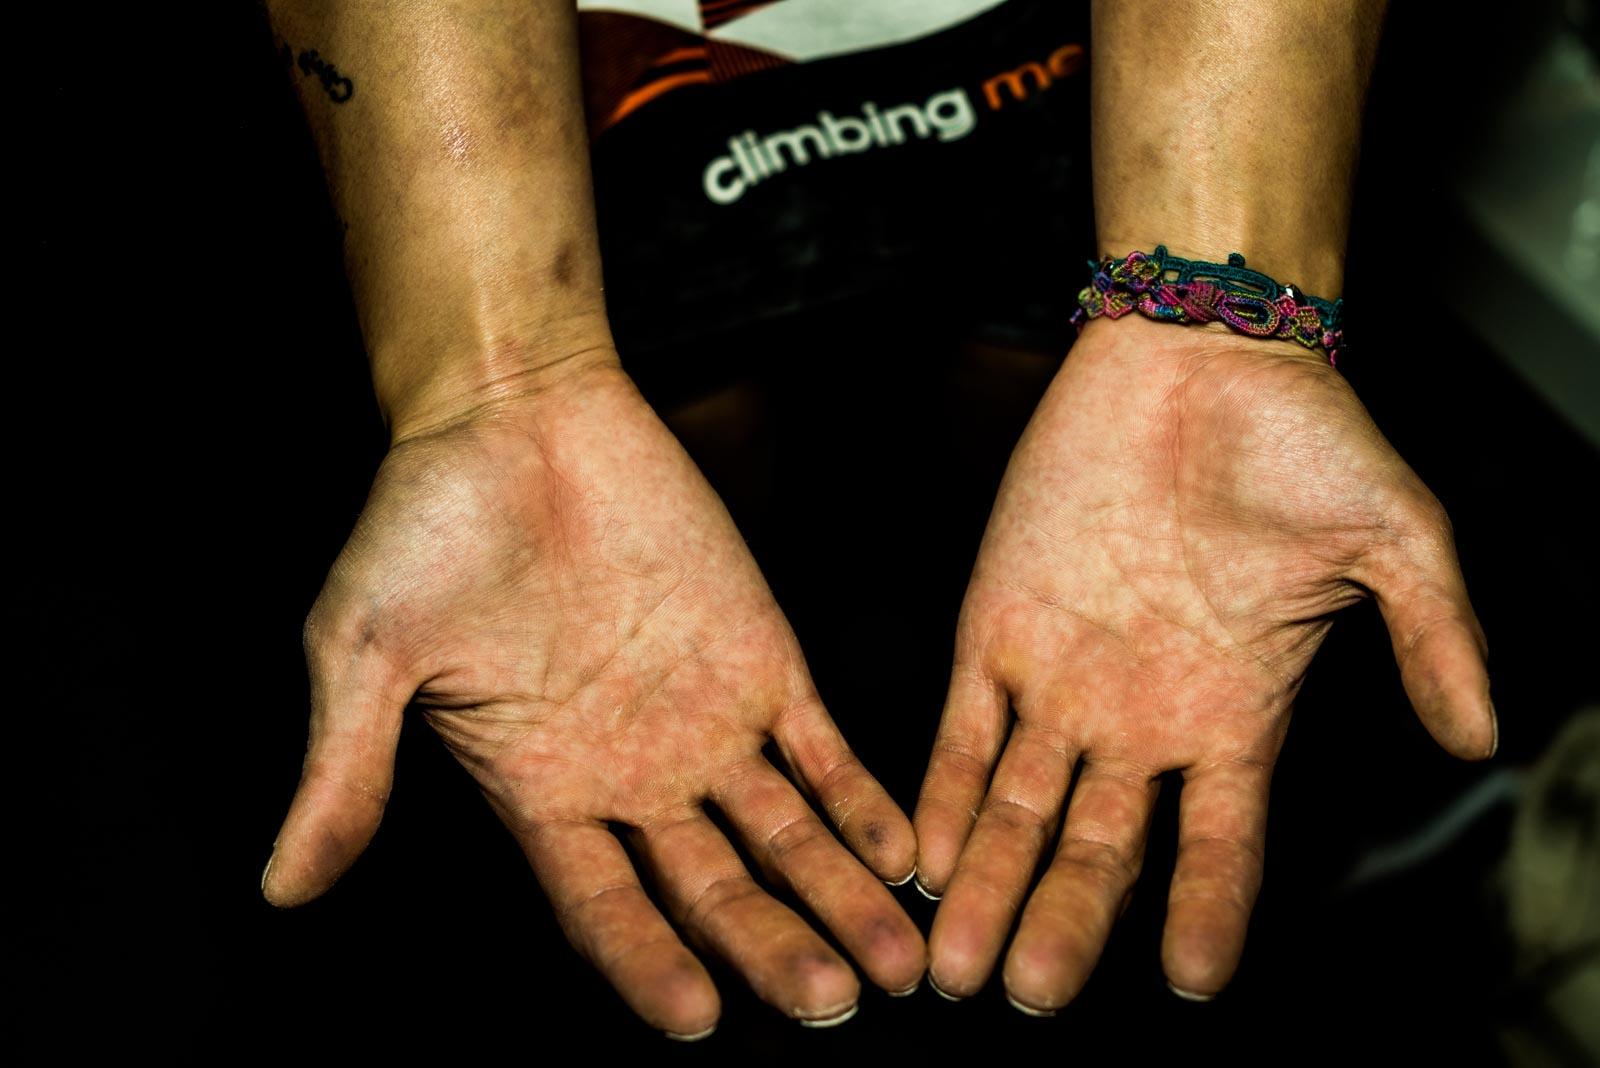 Hands of Sa Sol, climber from South-Korea